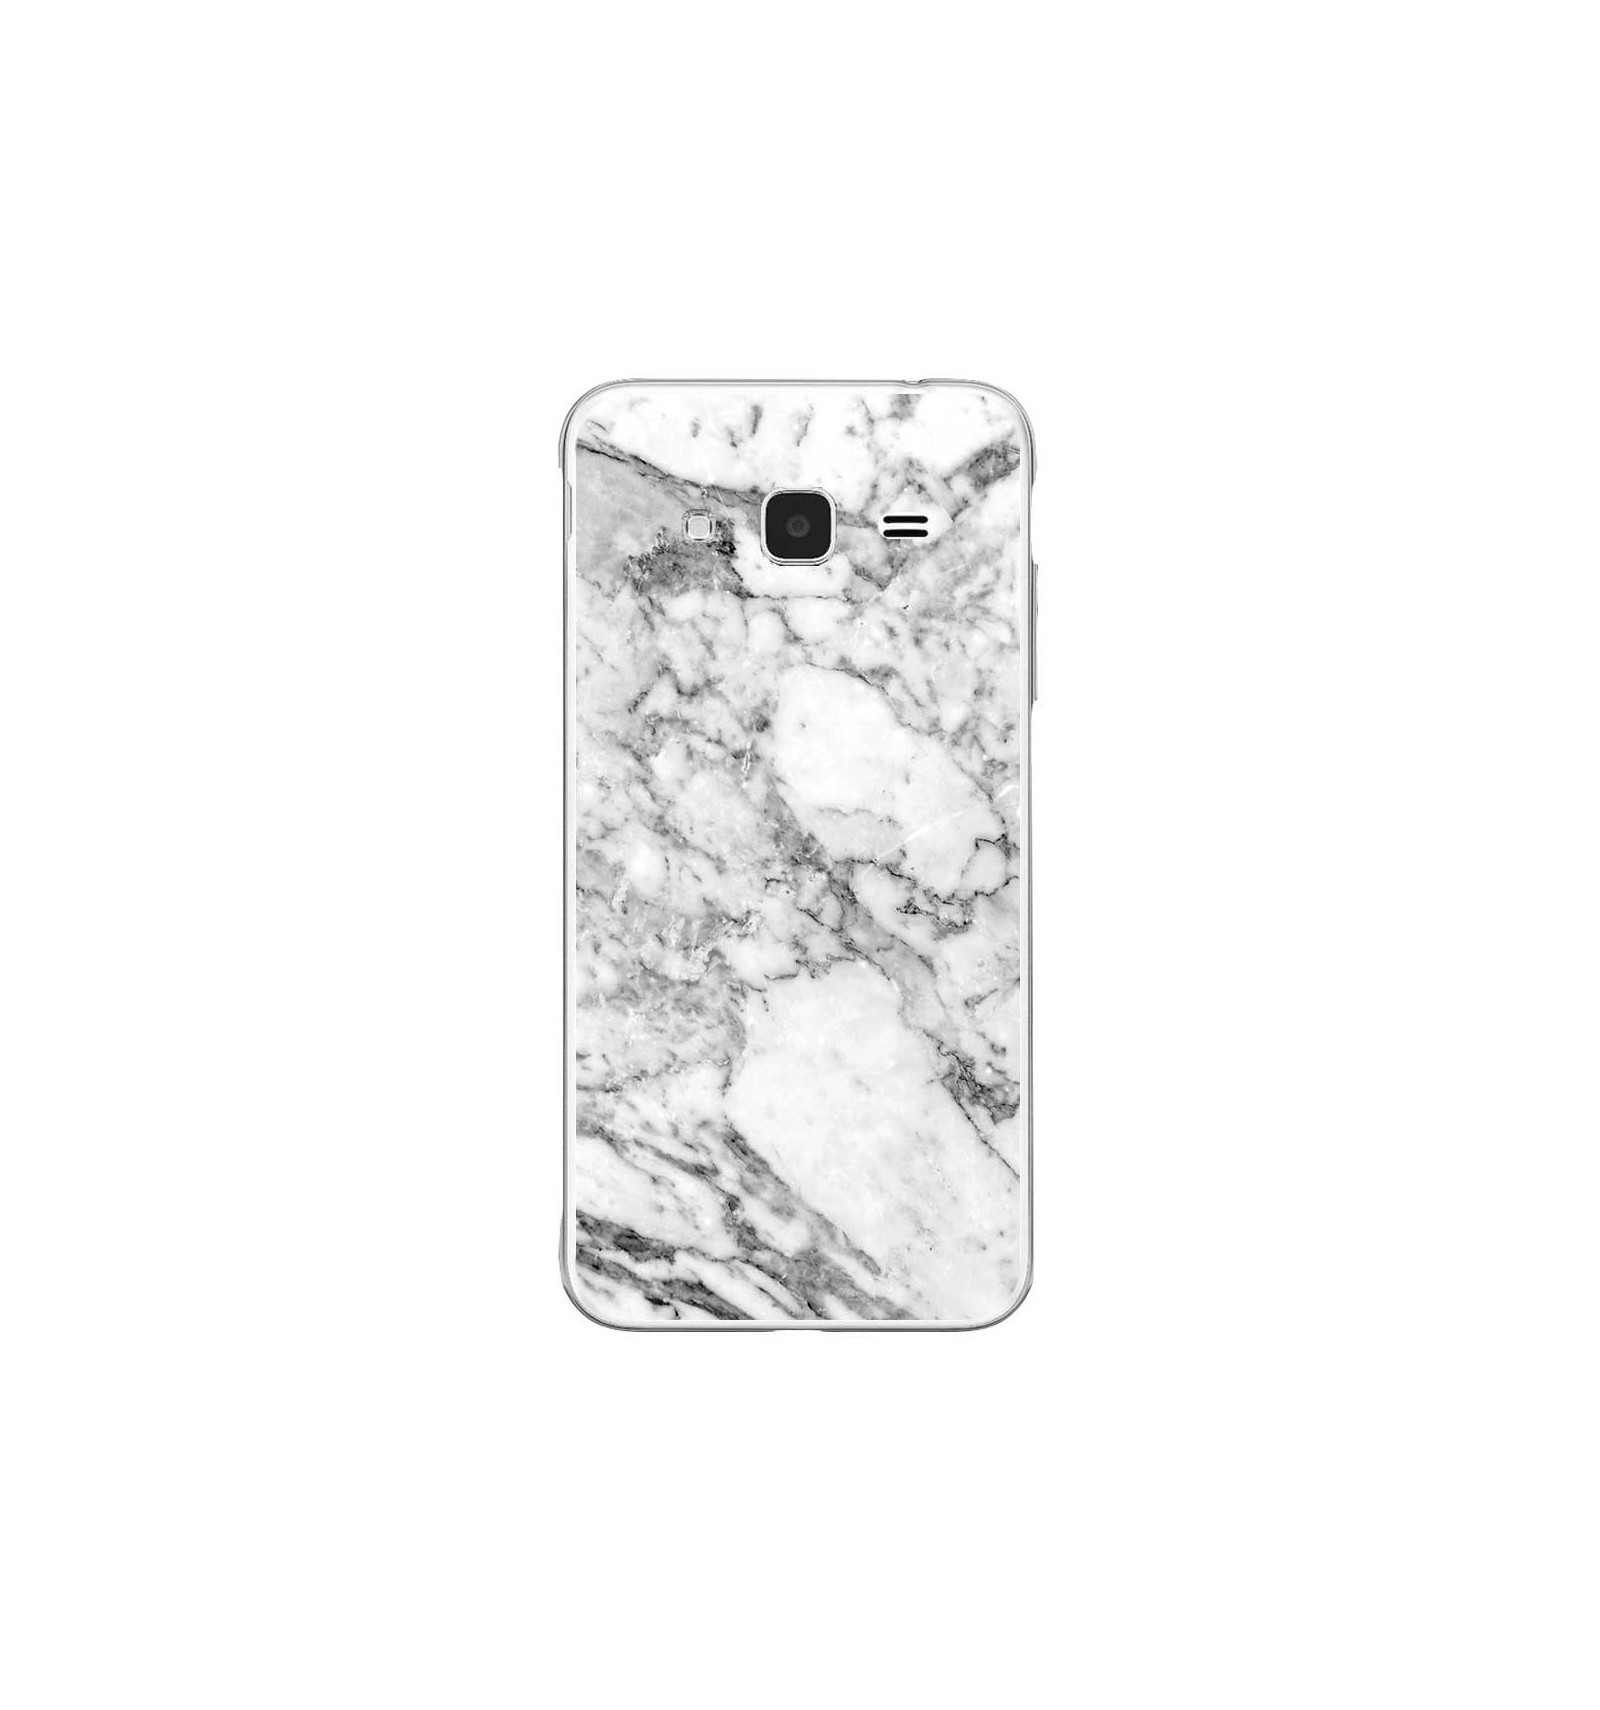 coque samsung j7 2016 marbre